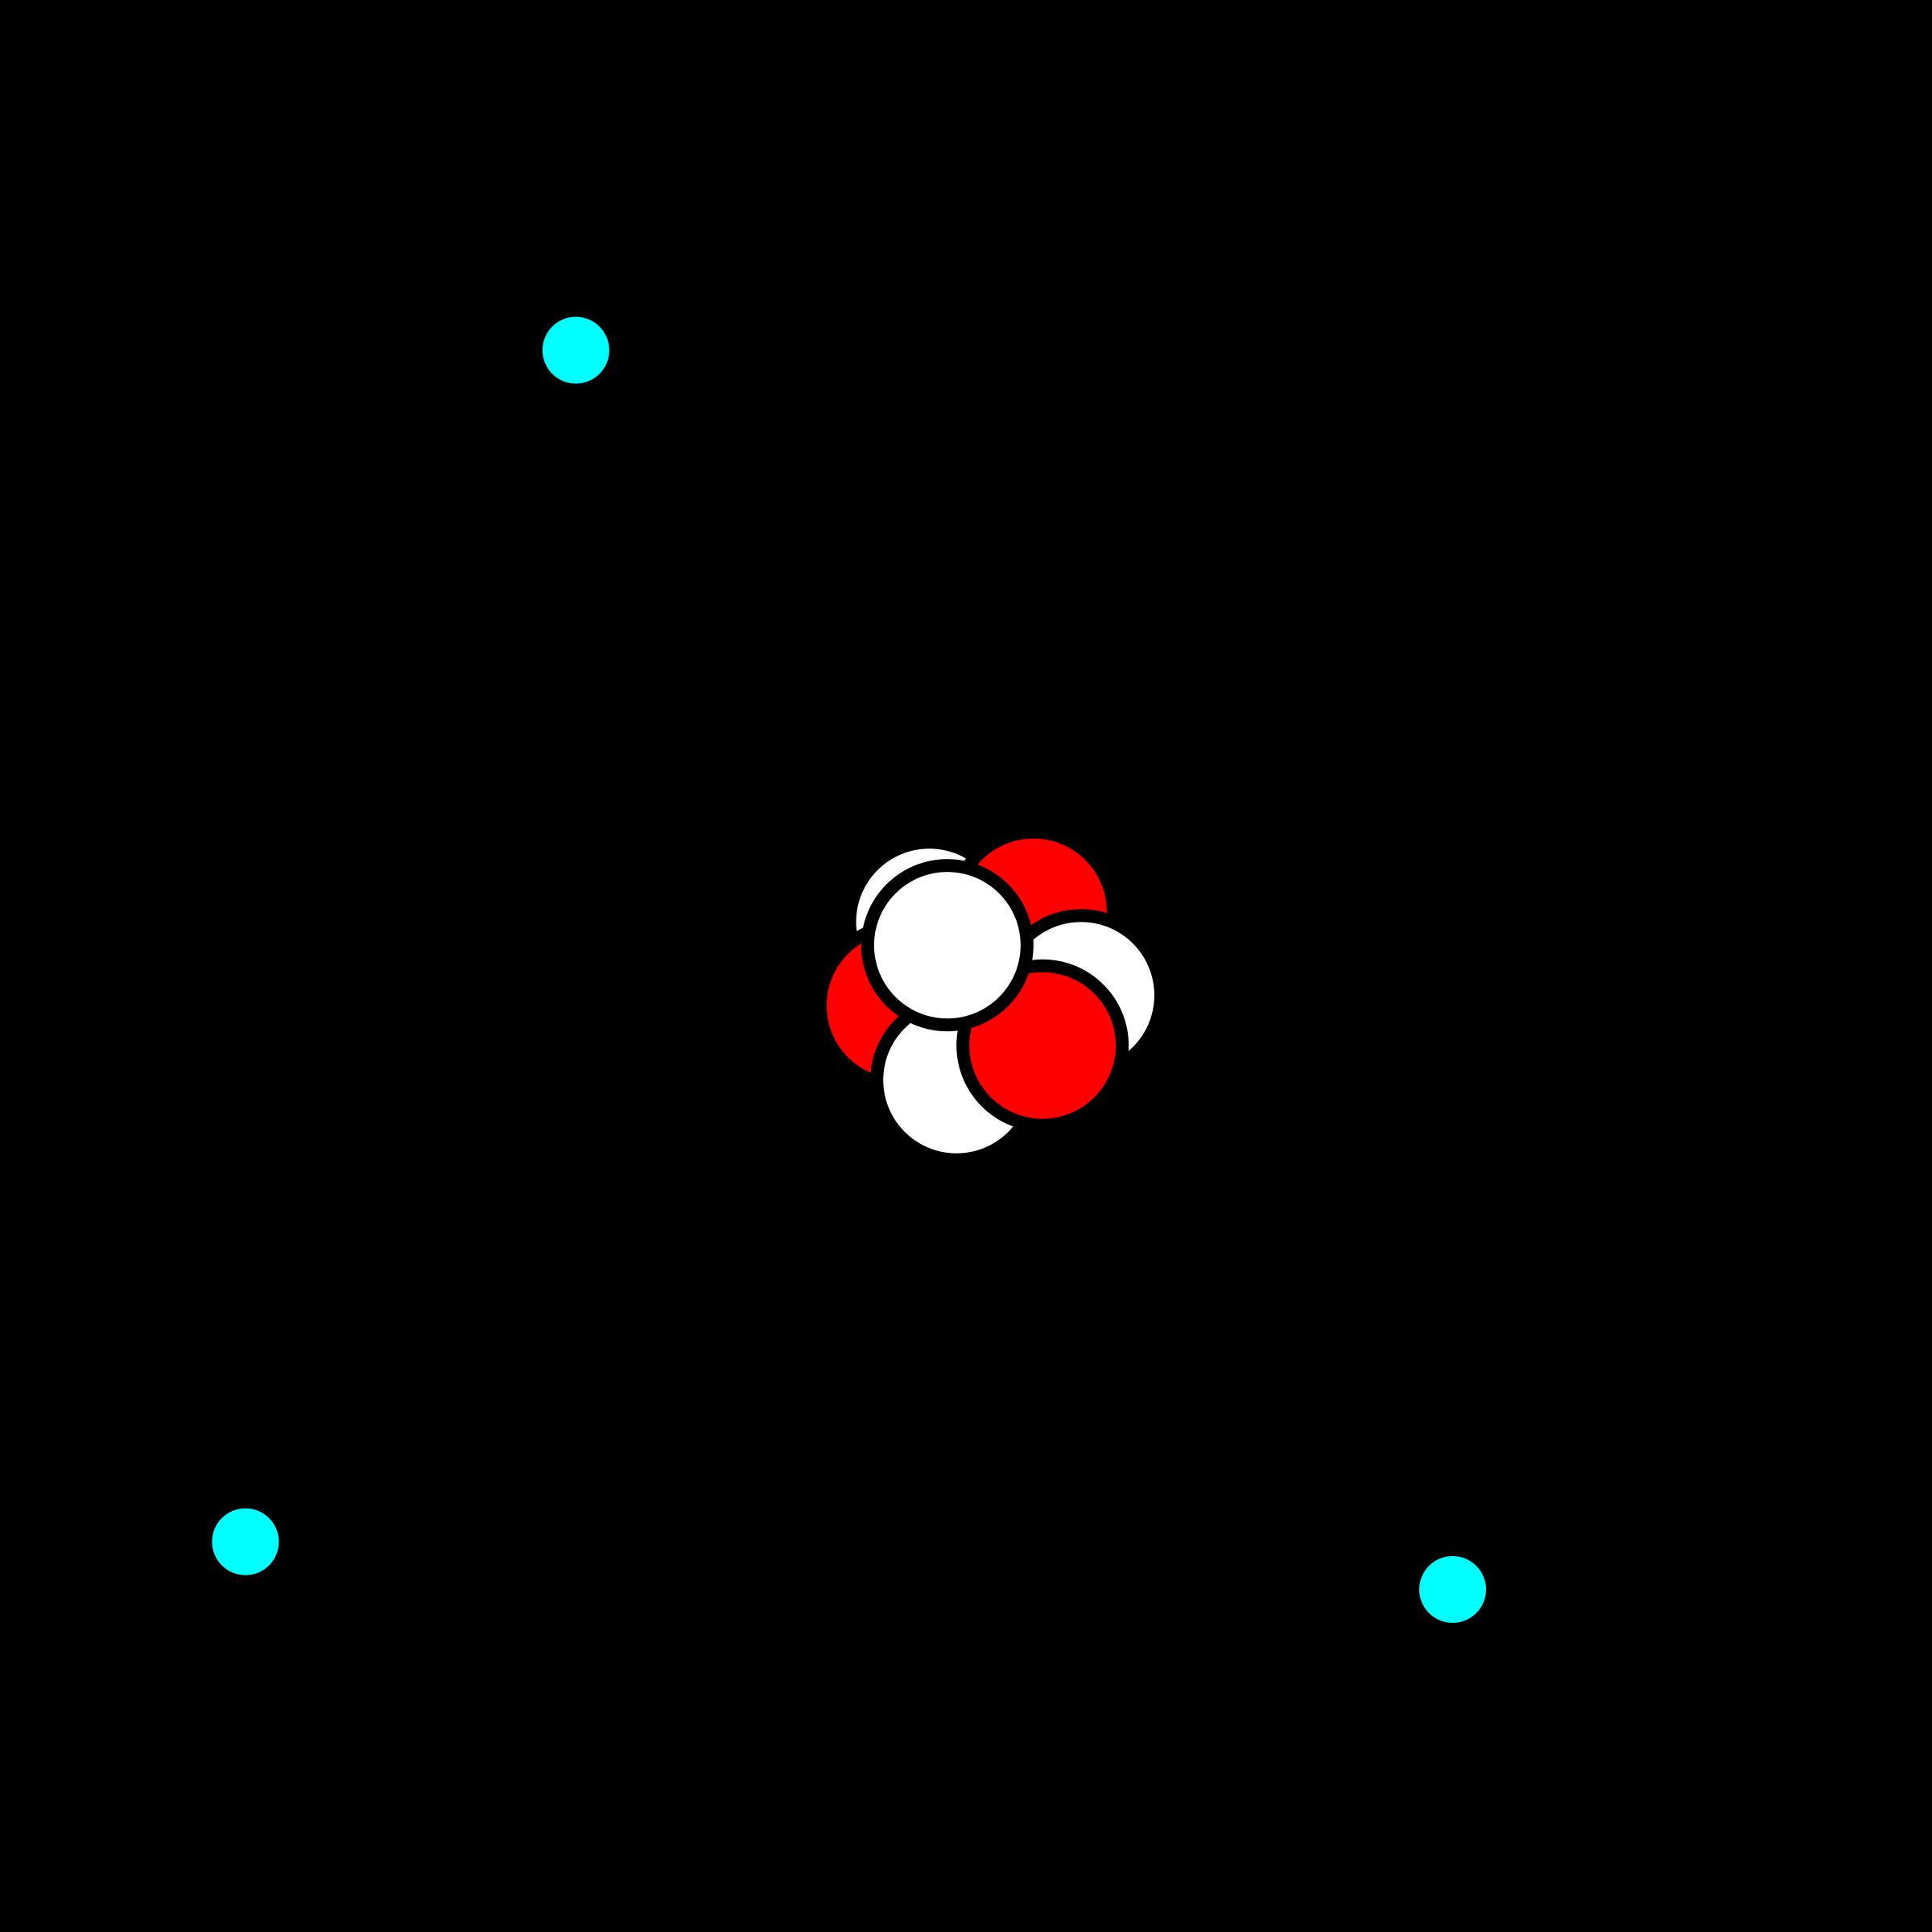 Lithium in bohr icons. Energy clipart atom model